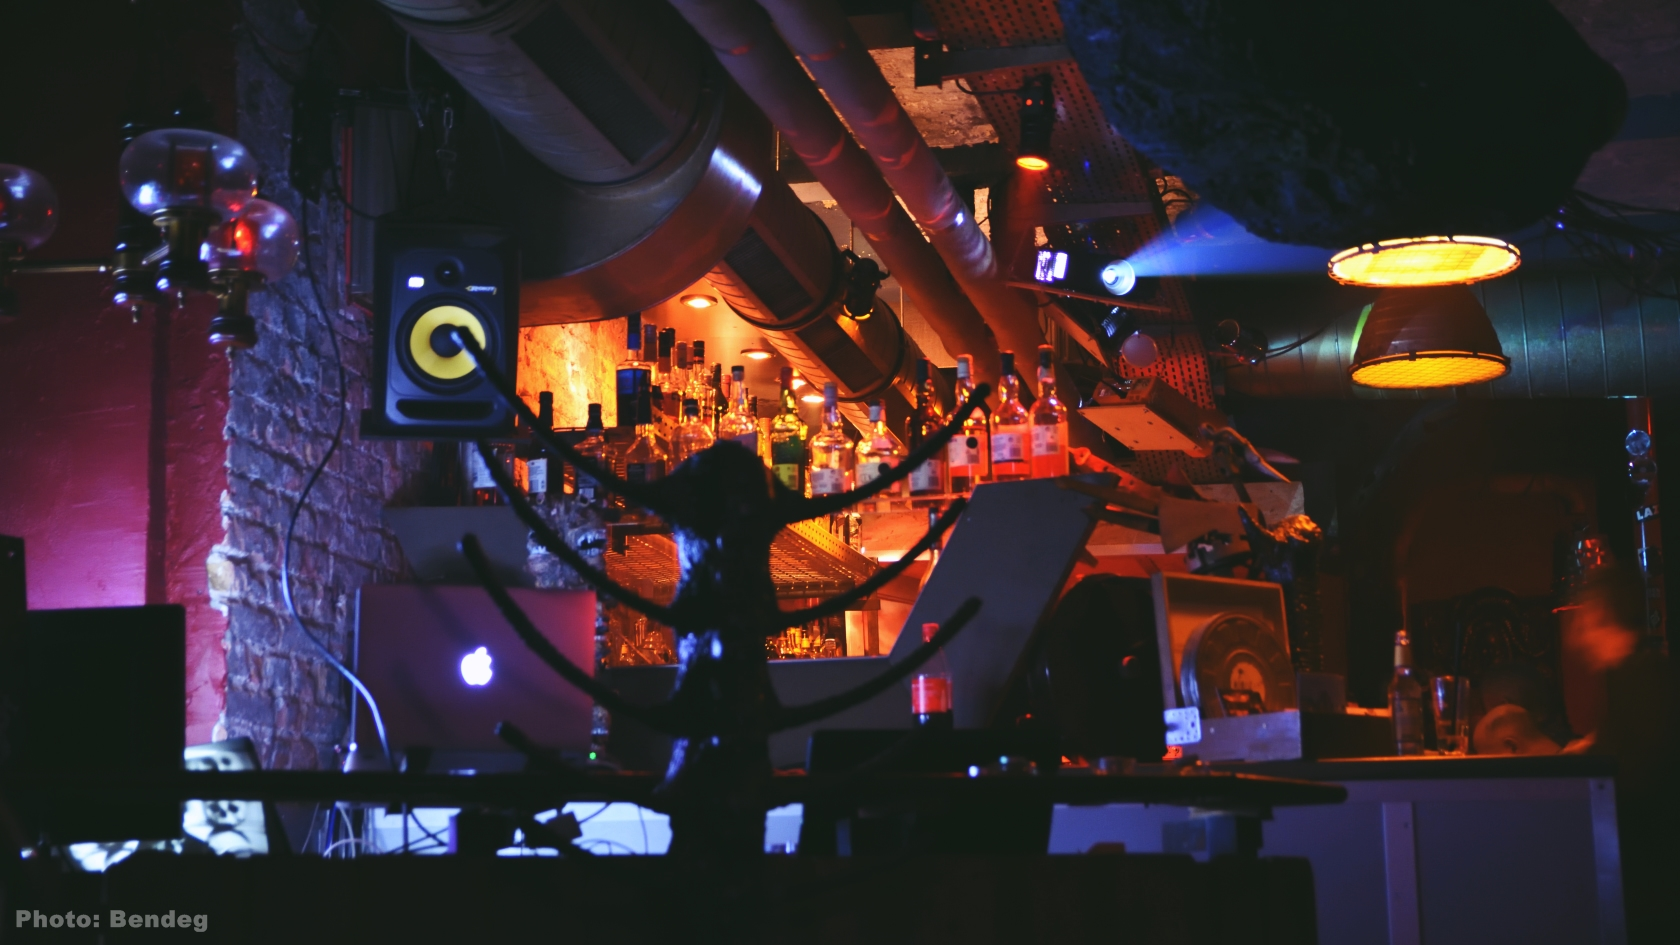 Liquid Sky Berlin Lsb02